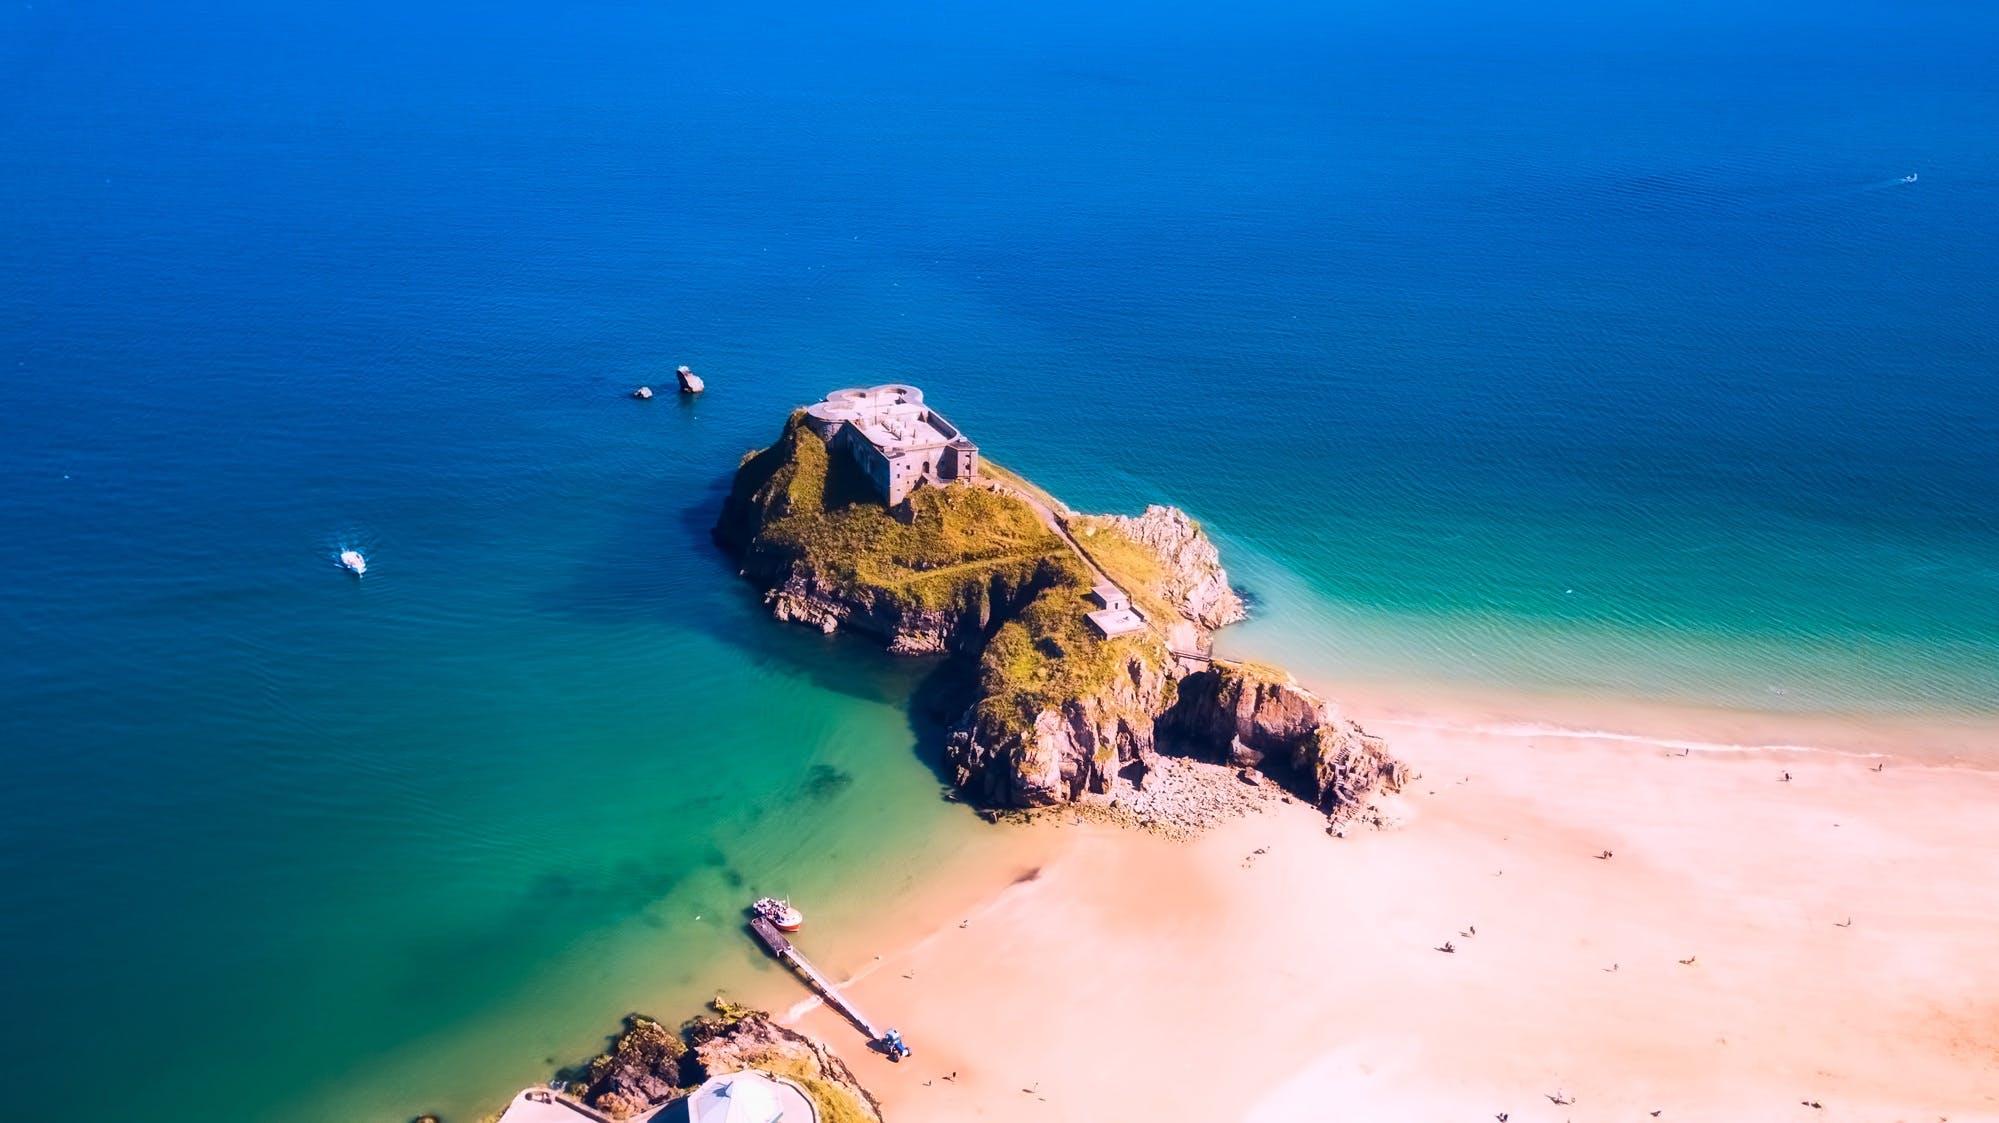 aerial view, beach, boat